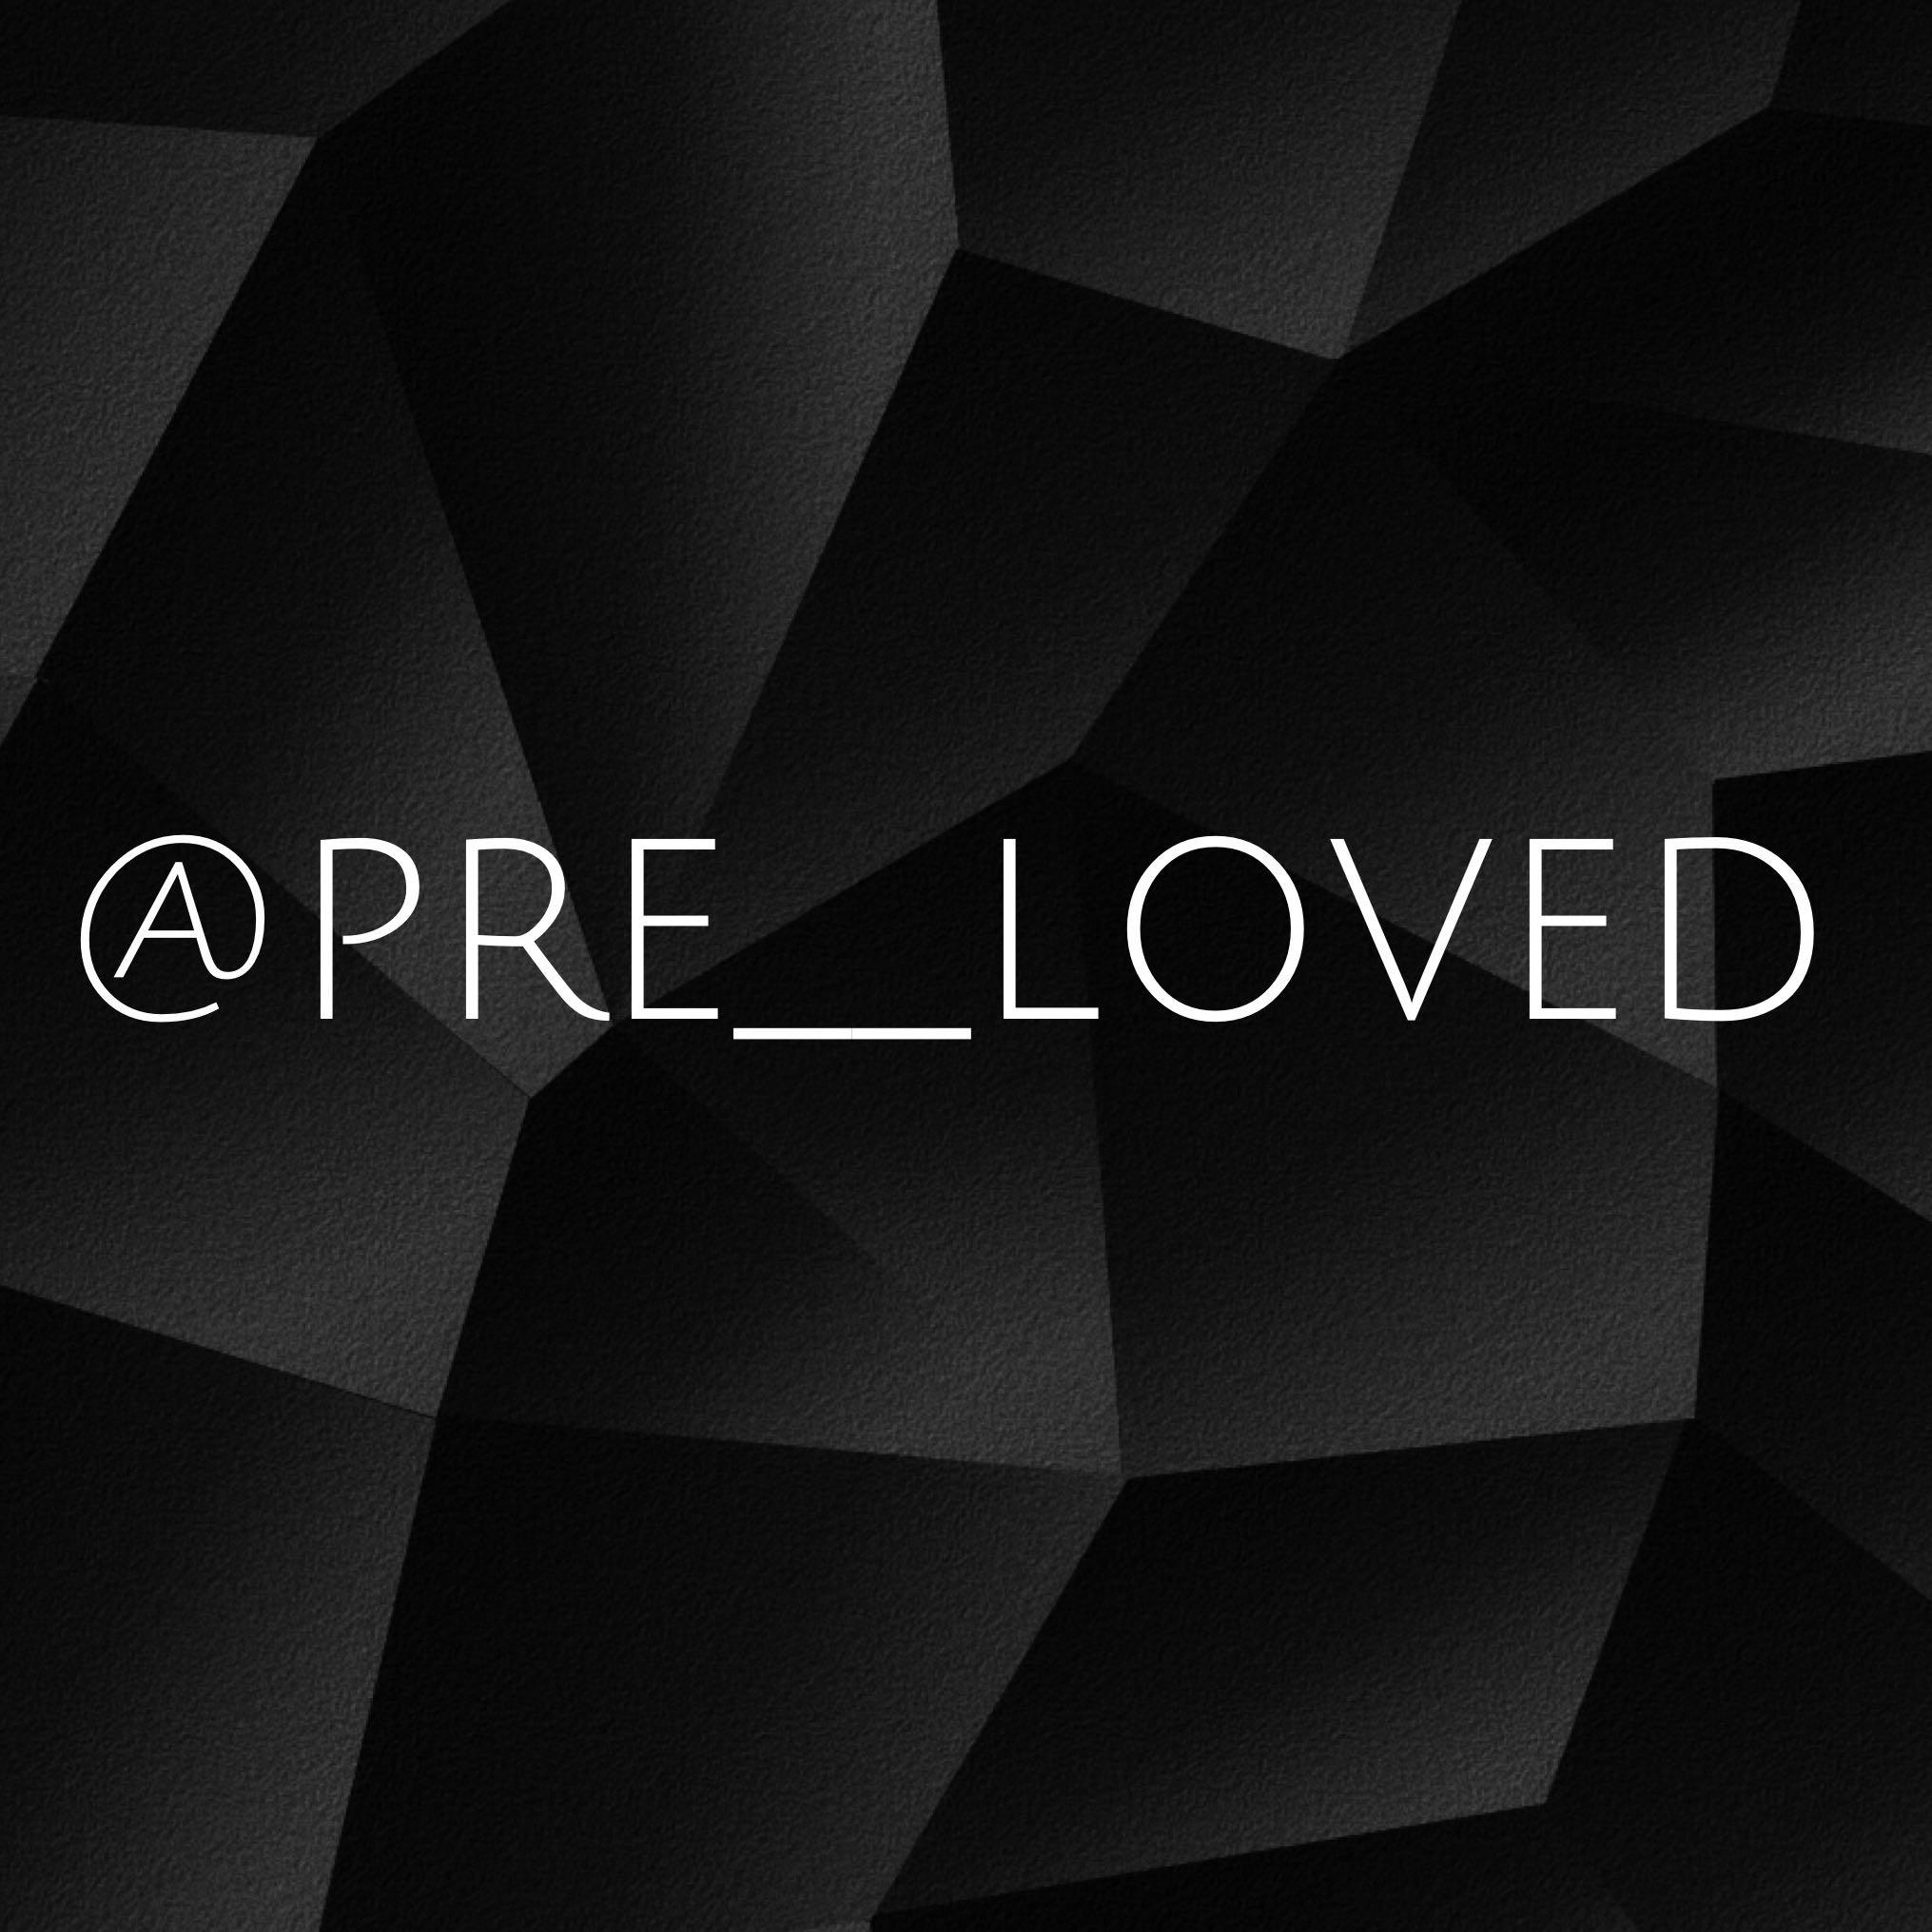 pre__loved